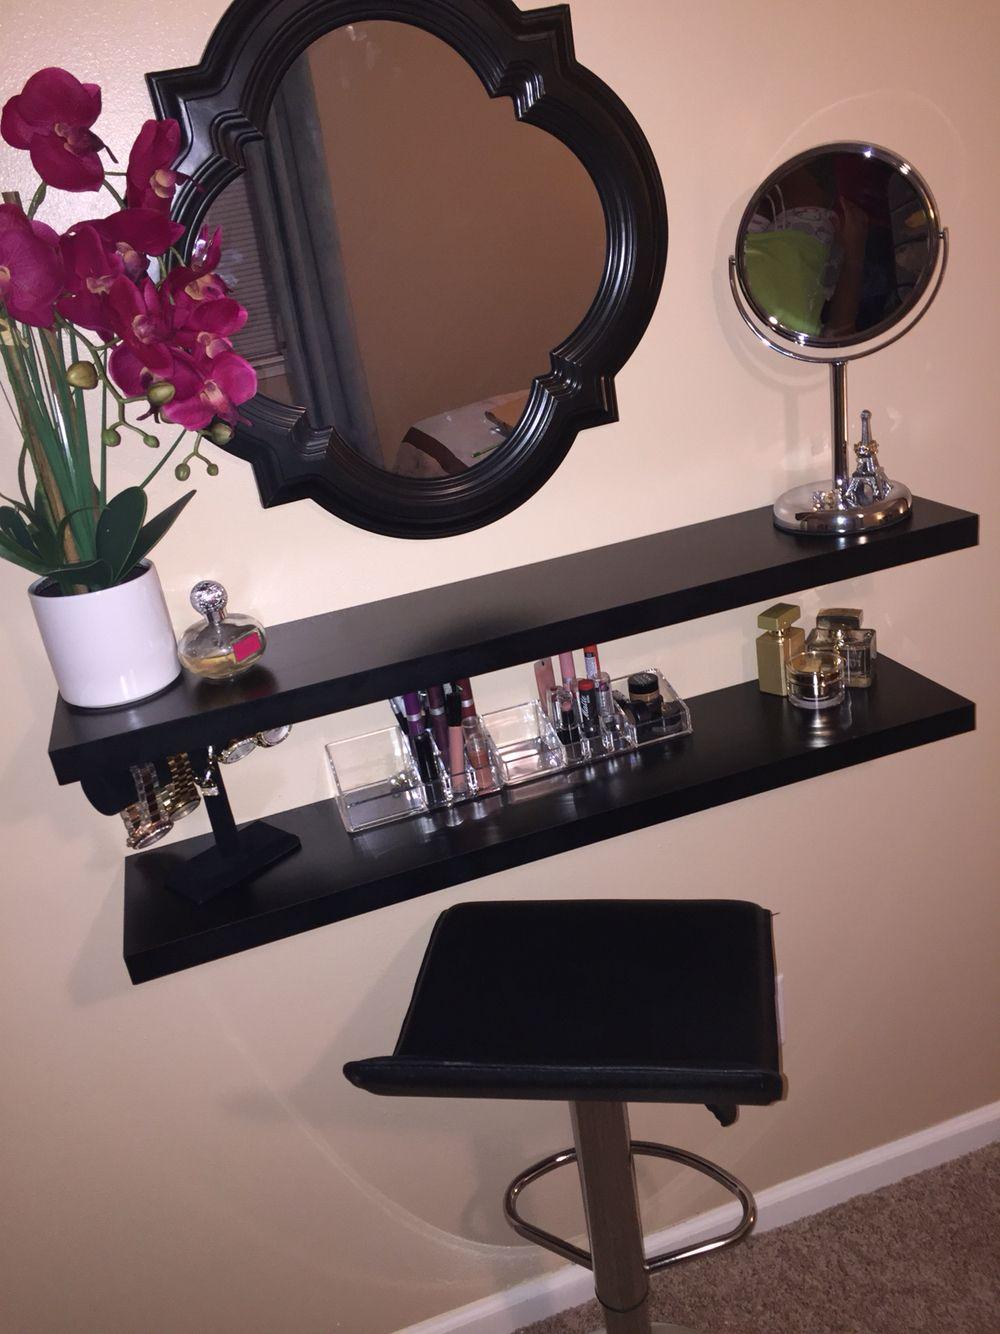 My very own diy vanity i made using floating shelves glam room